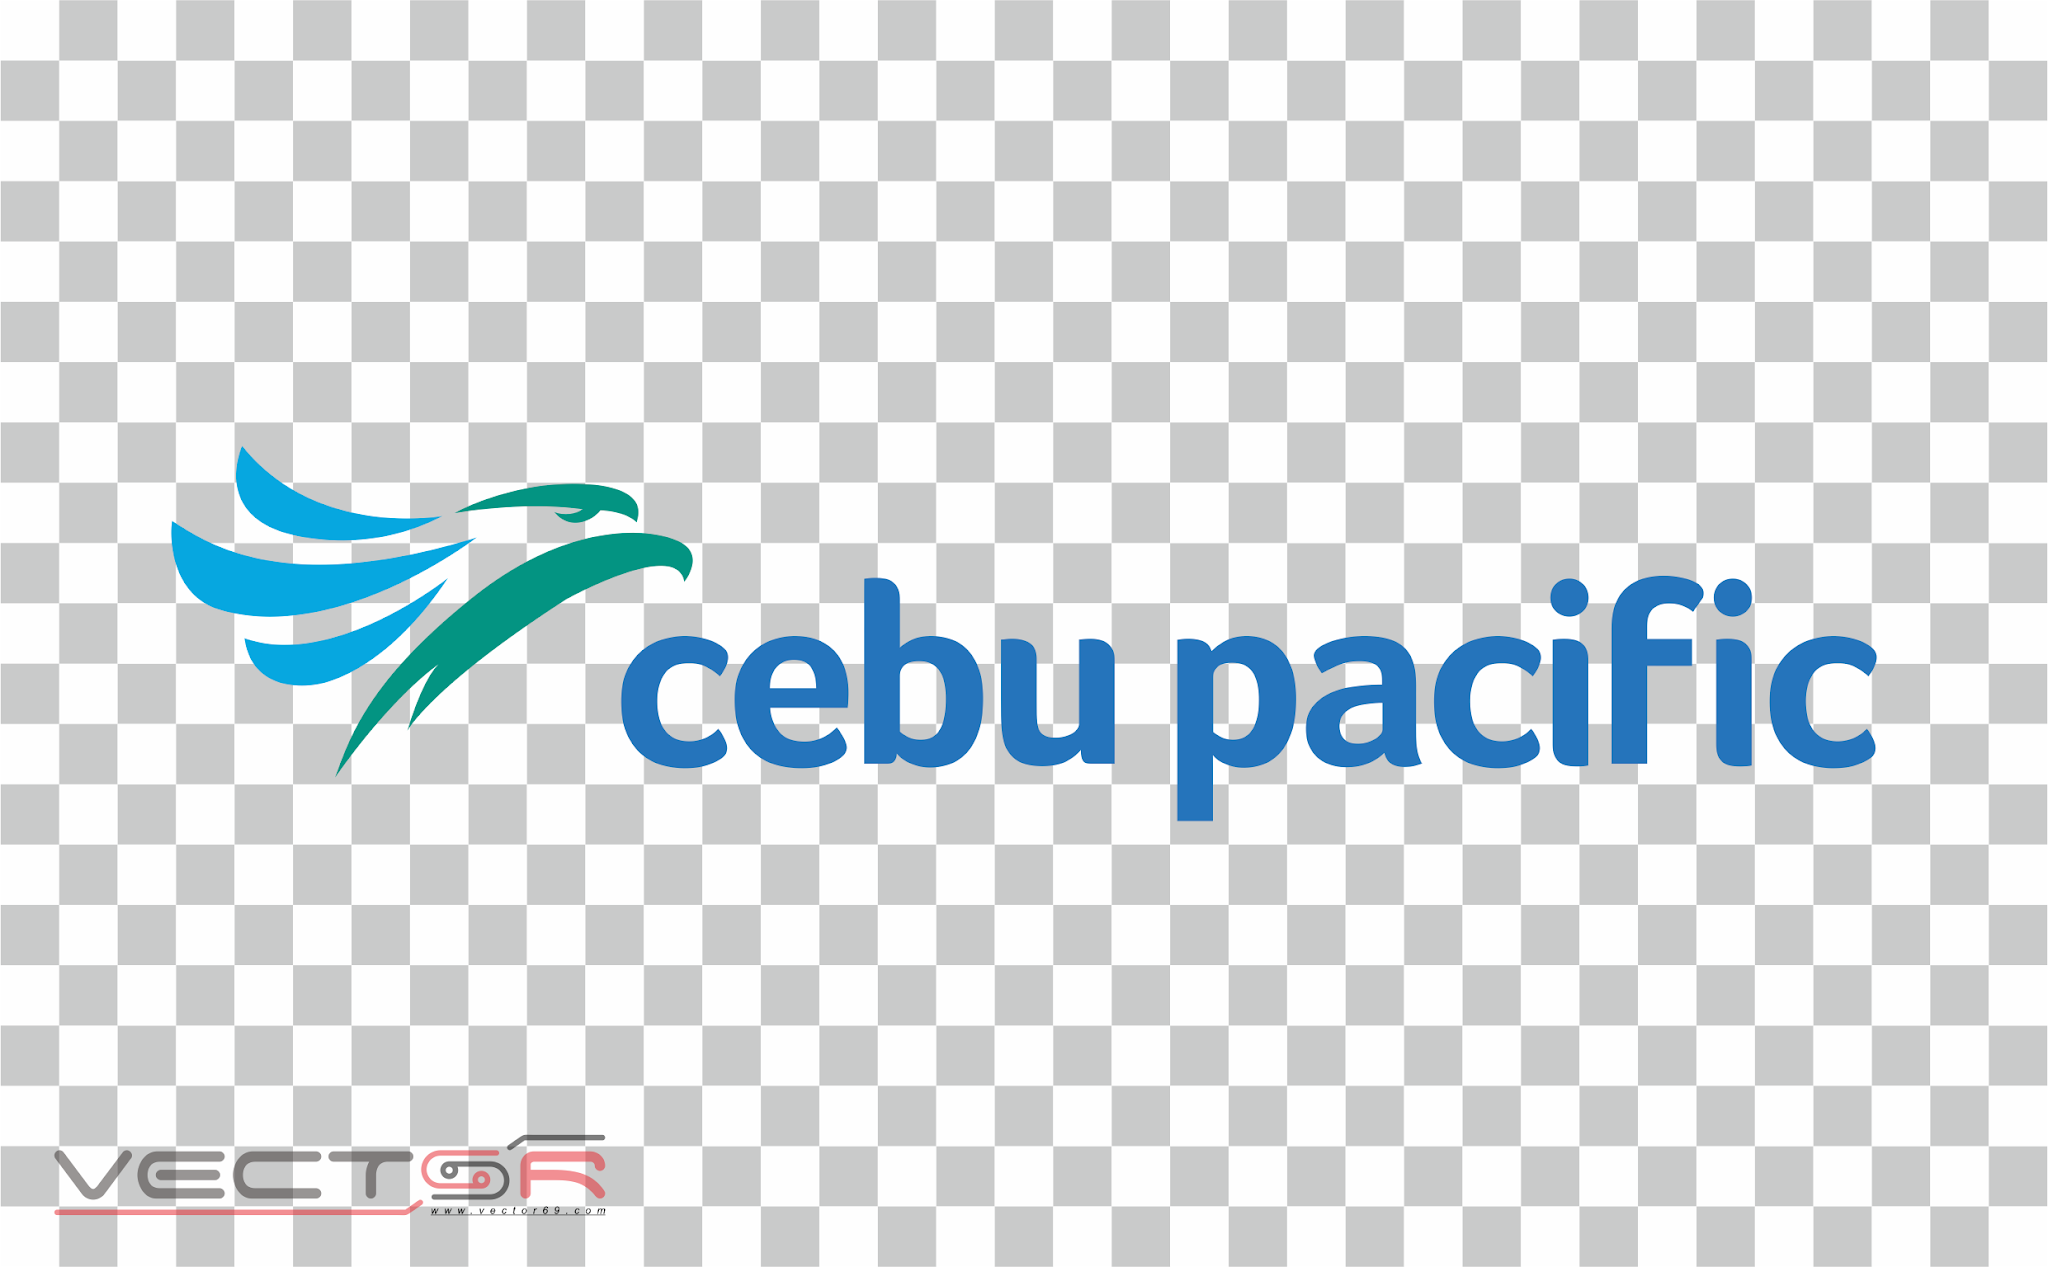 Cebu Pacific Logo - Download .PNG (Portable Network Graphics) Transparent Images